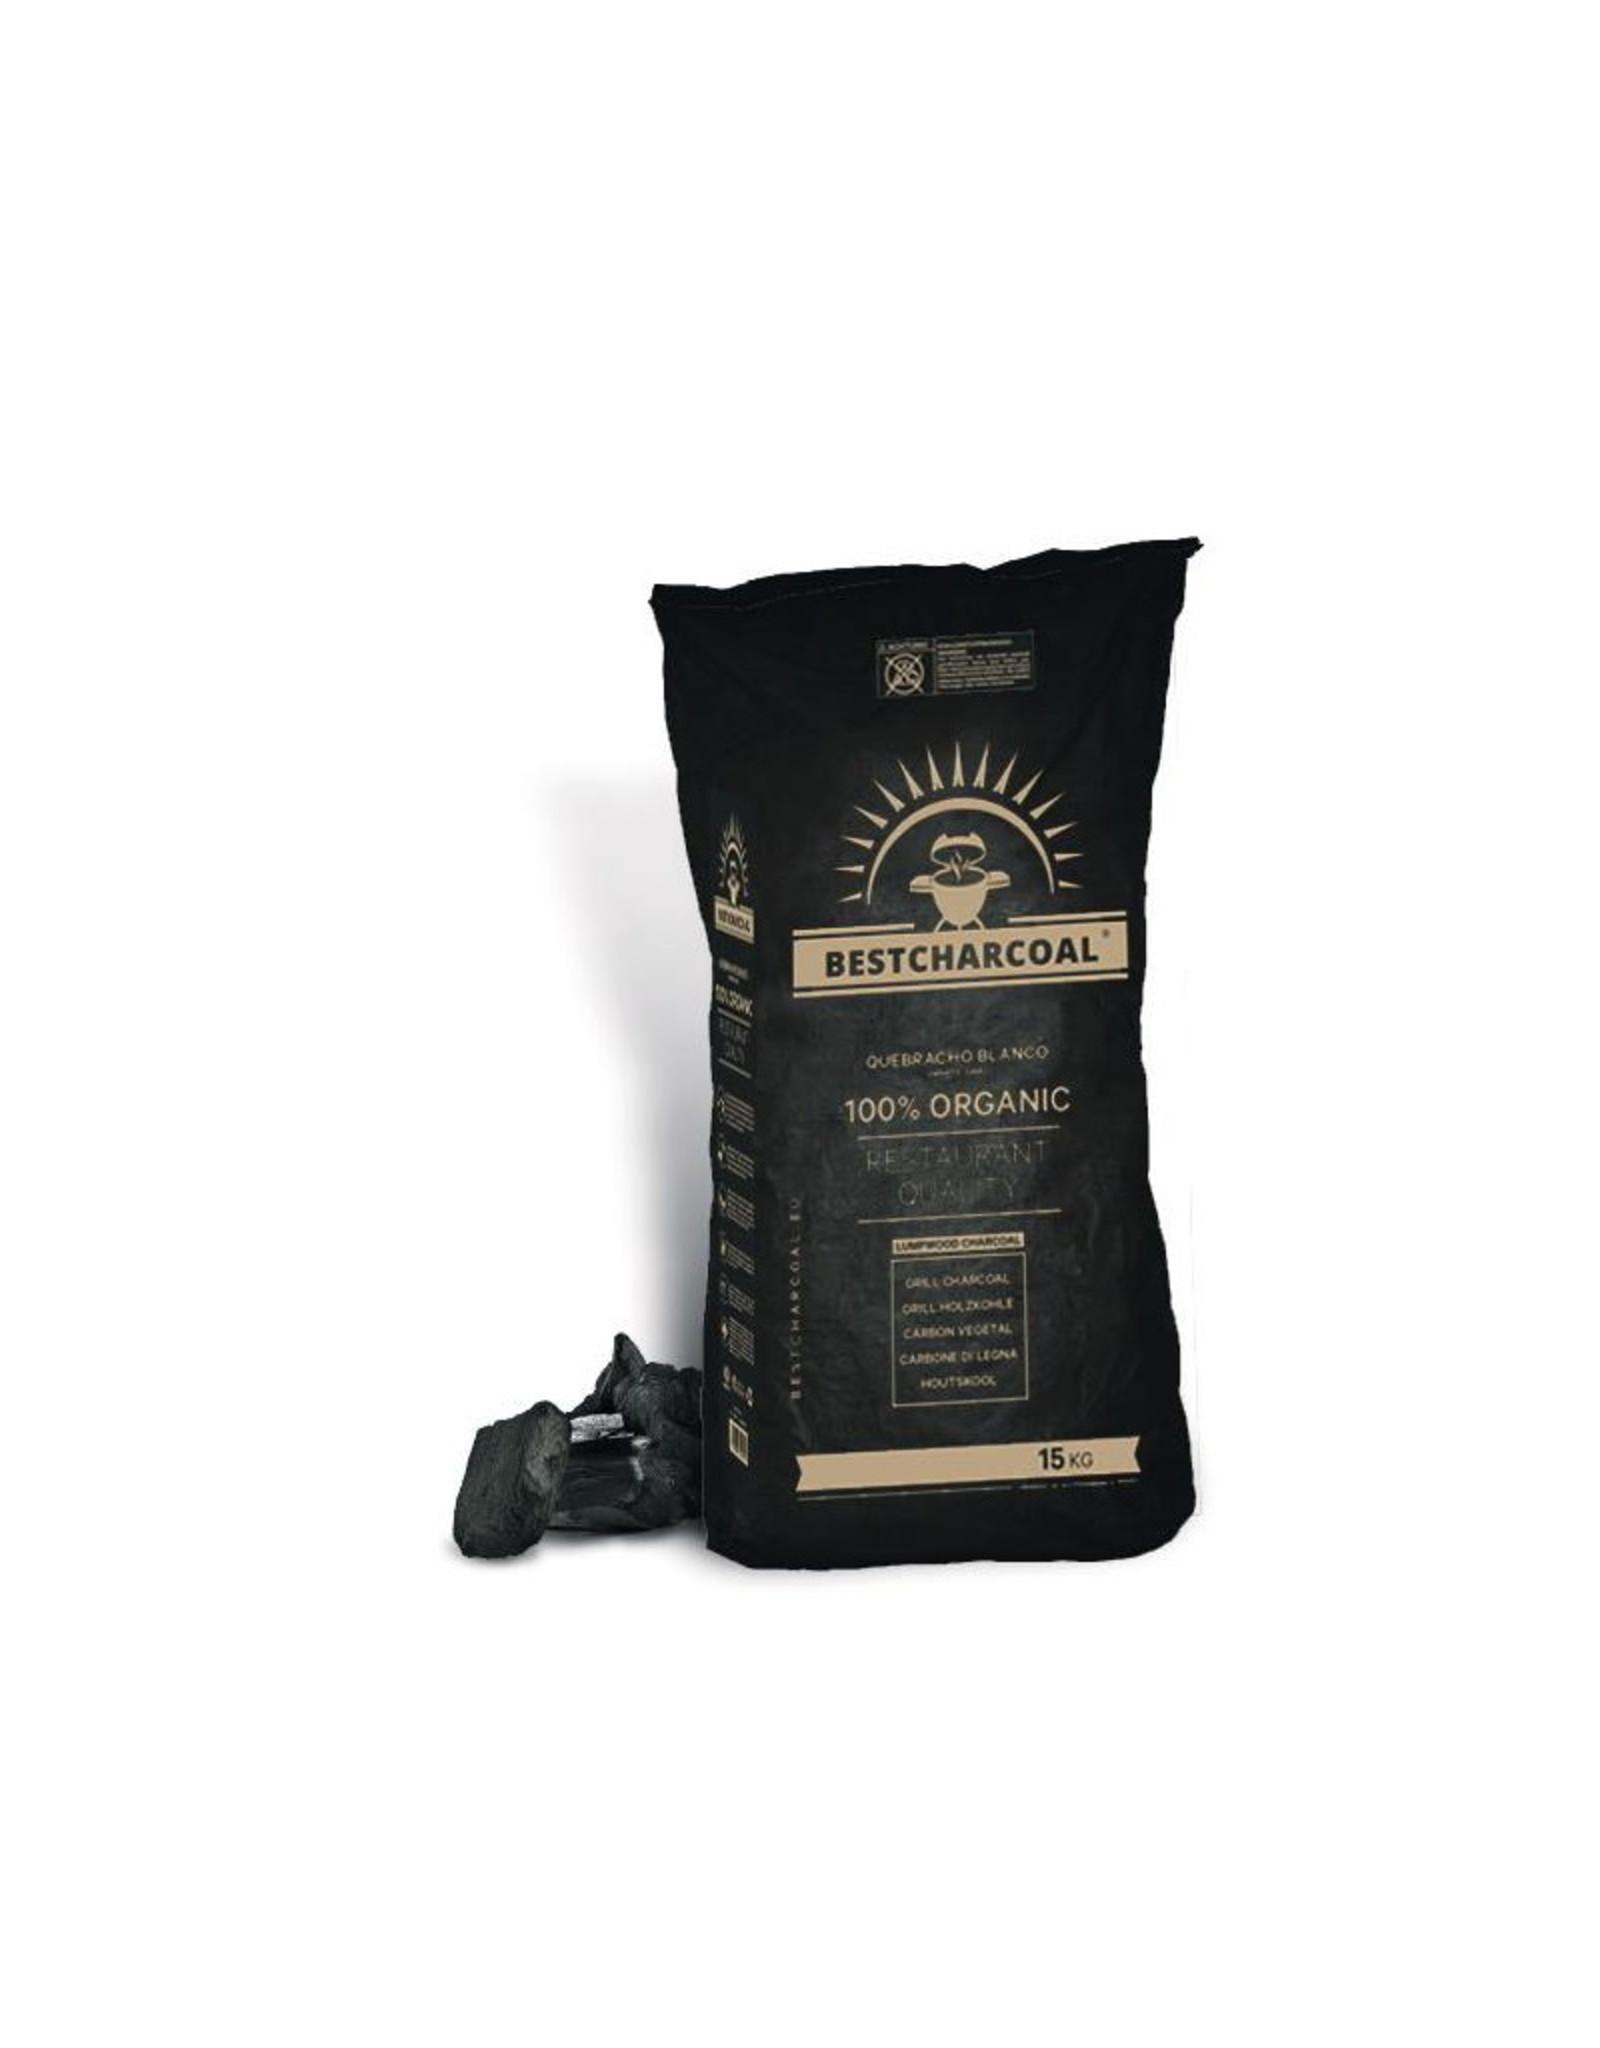 Best Charcoal Quebracho Blanco Houtskool 15kg